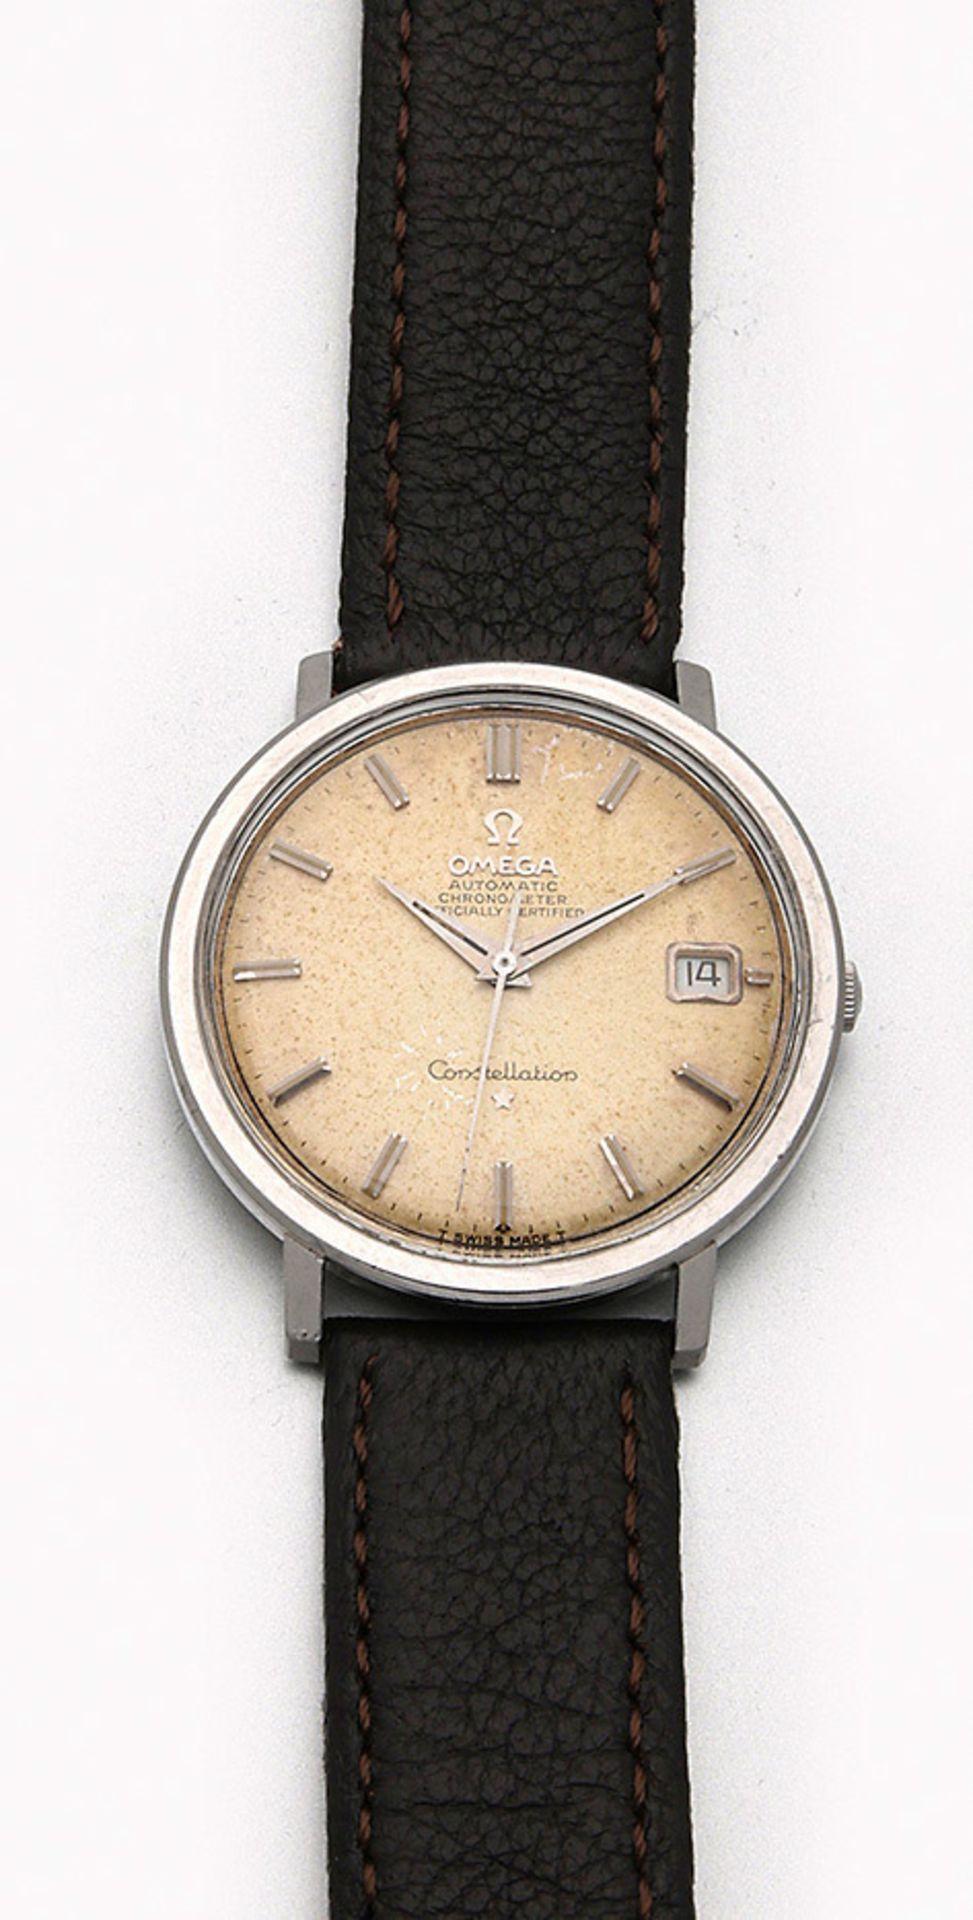 "Omega-Herrenarmbanduhr ""Constellation"" aus den 60er Jahren"